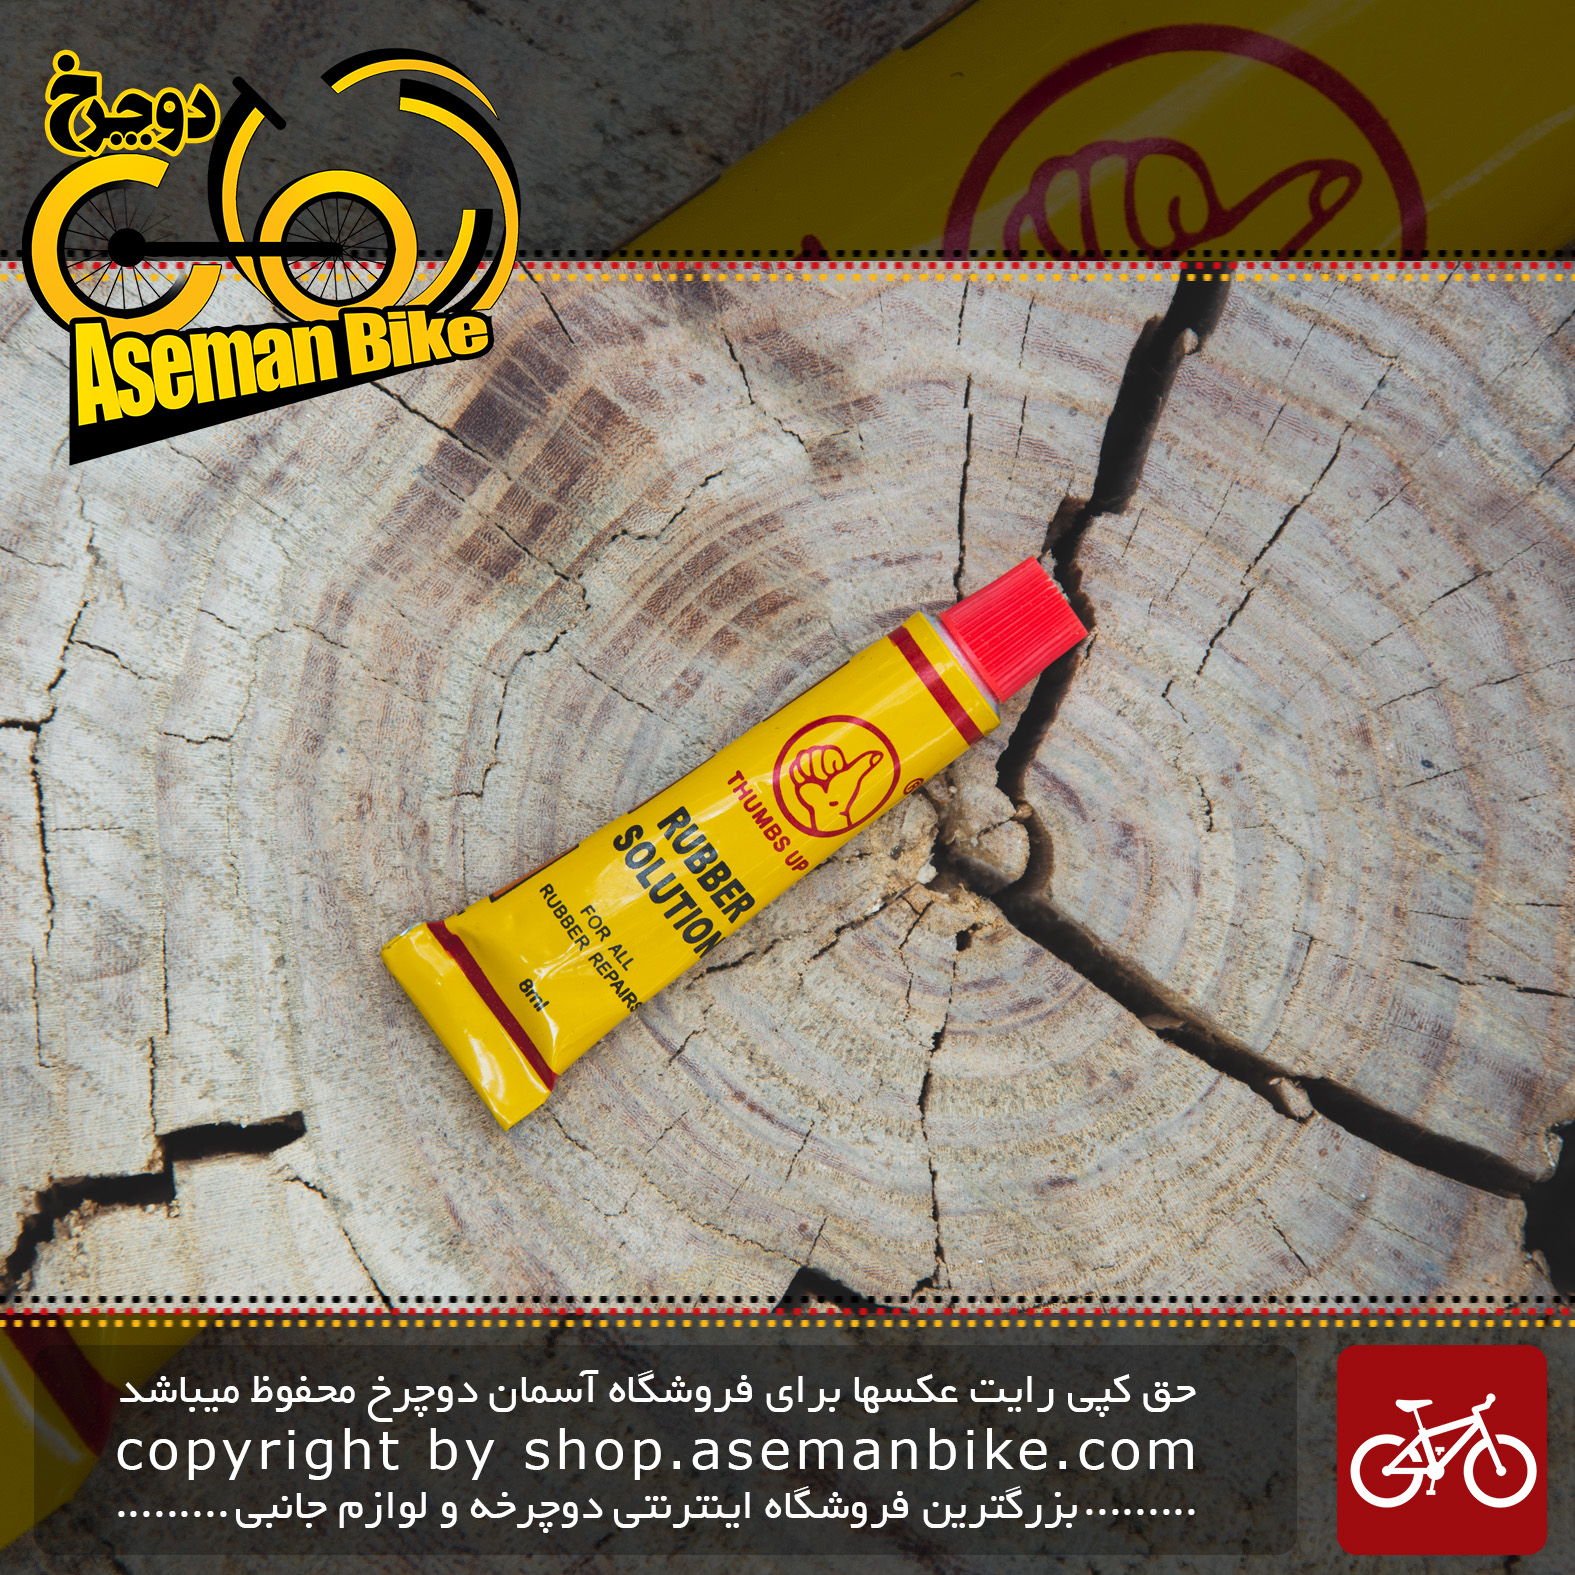 چسب مایع پنچرگیری دوچرخه رابر سولوشن 8 میلی لیتری Bicycle Repair Glue Rubber Solution 8ml